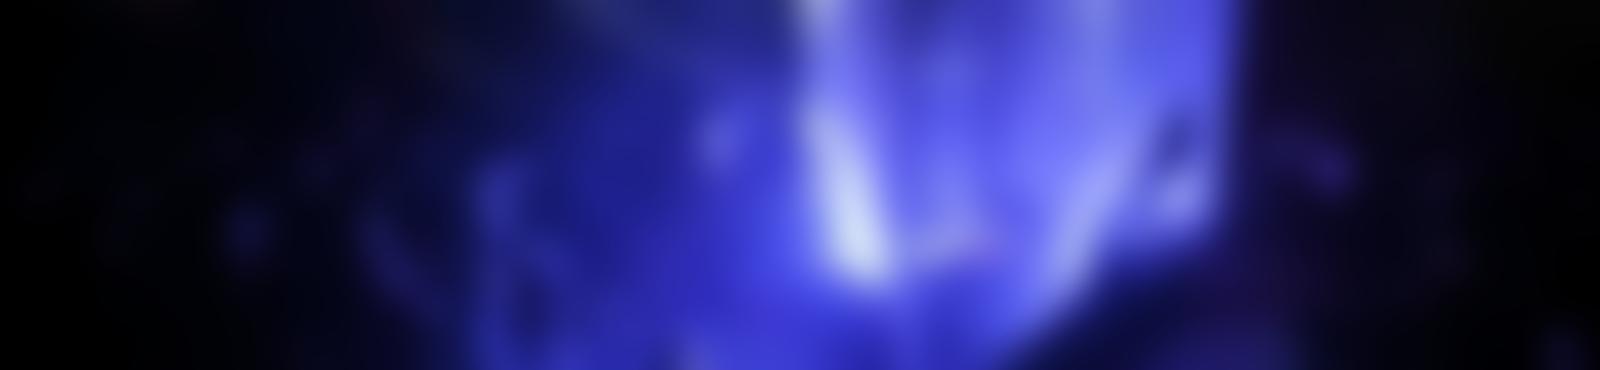 Blurred 1bda118e c121 464c 8ed2 6b208e486e5f